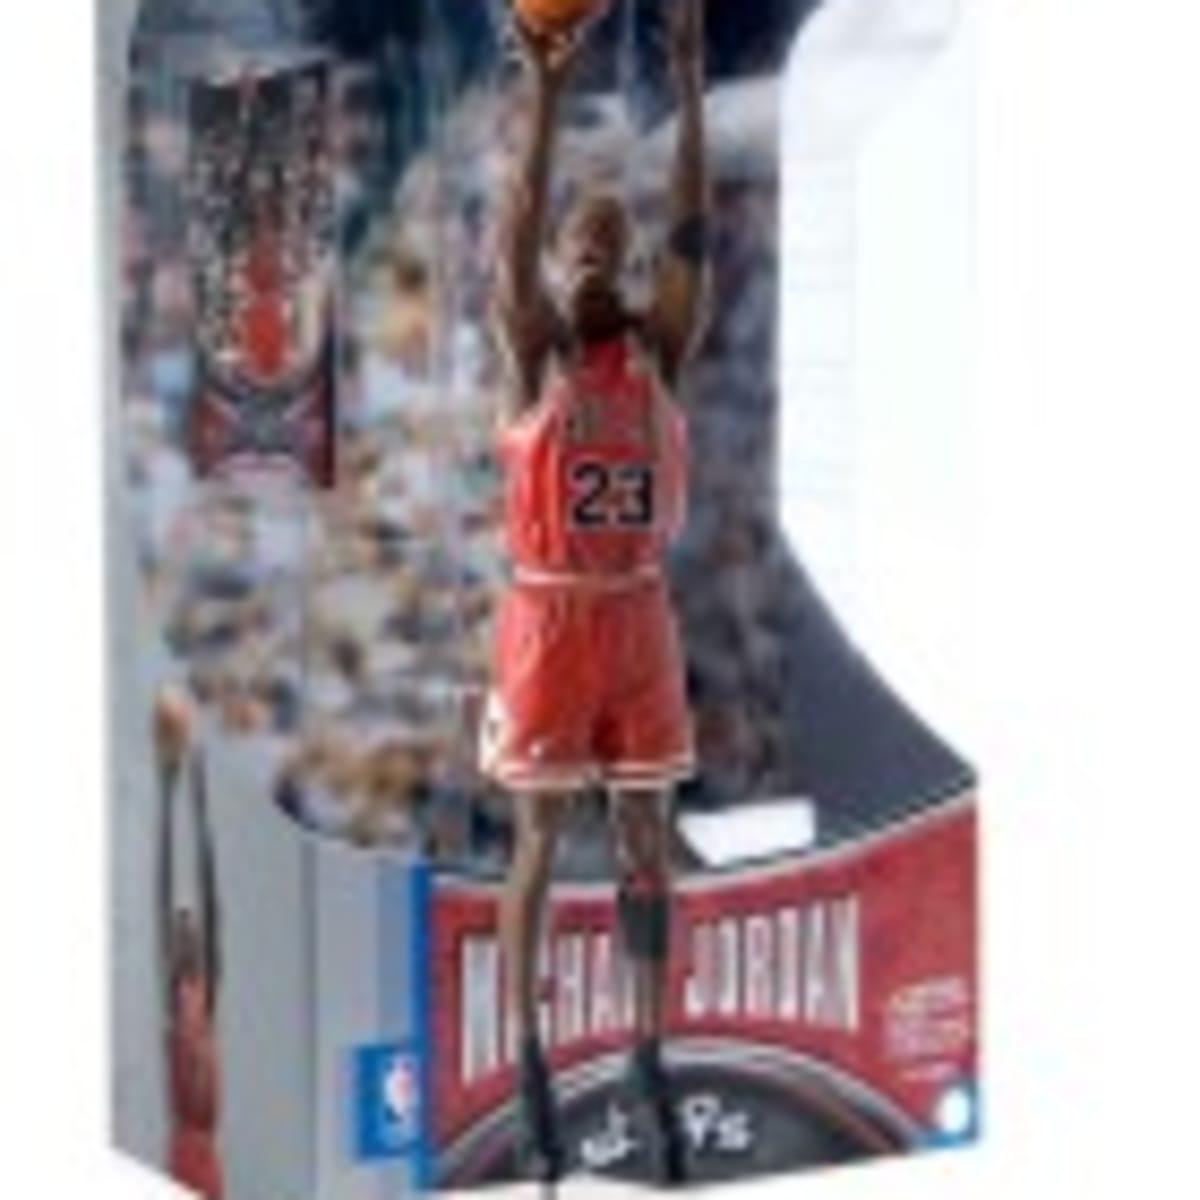 "1998 NBA Finals Winning Last Shot Michael Jordan 6 /"" Figure Toy"